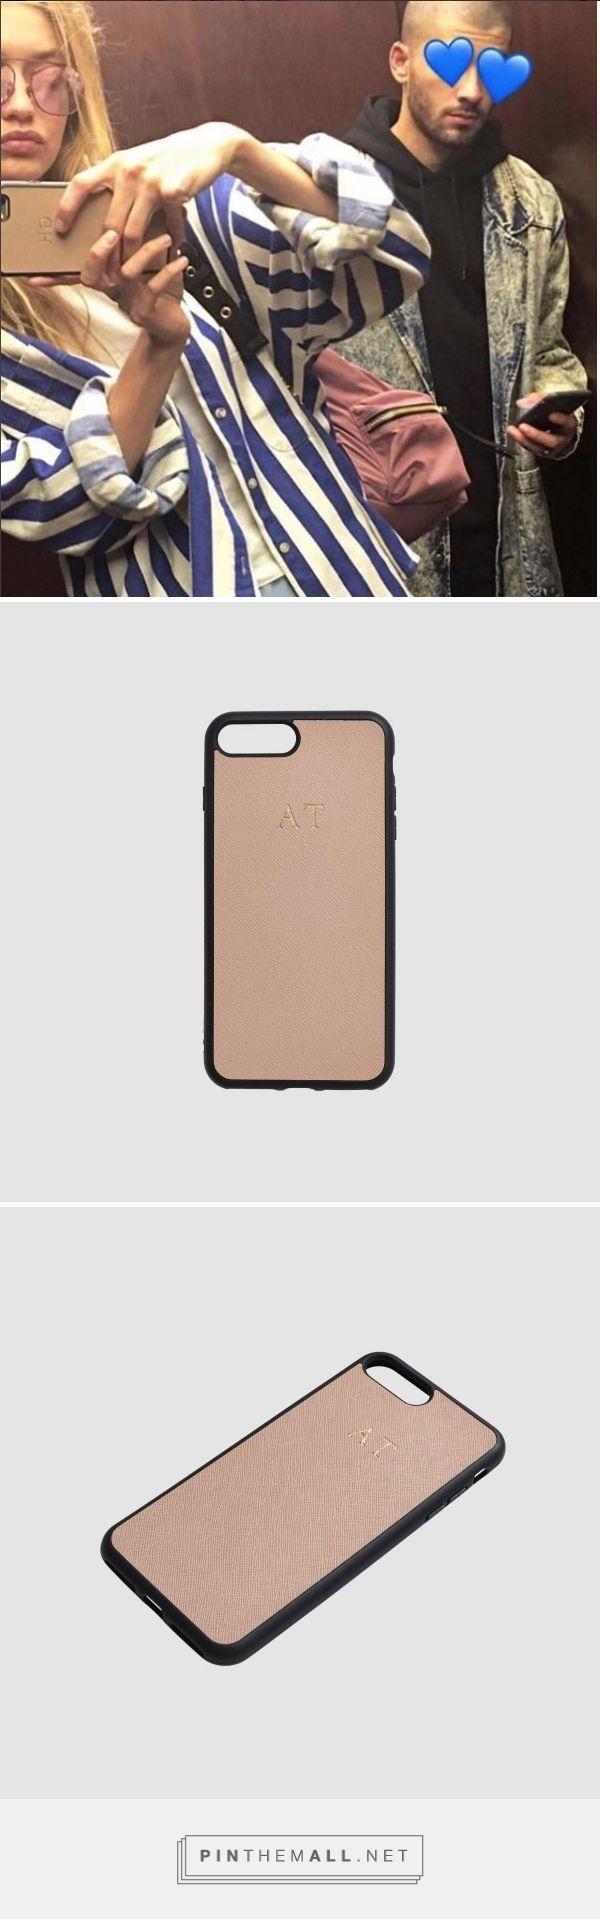 cheaper 5ec44 e2bd7 Taupe iPhone 7 Plus/iPhone 8 Plus Case | Relationship Goals | Iphone ...